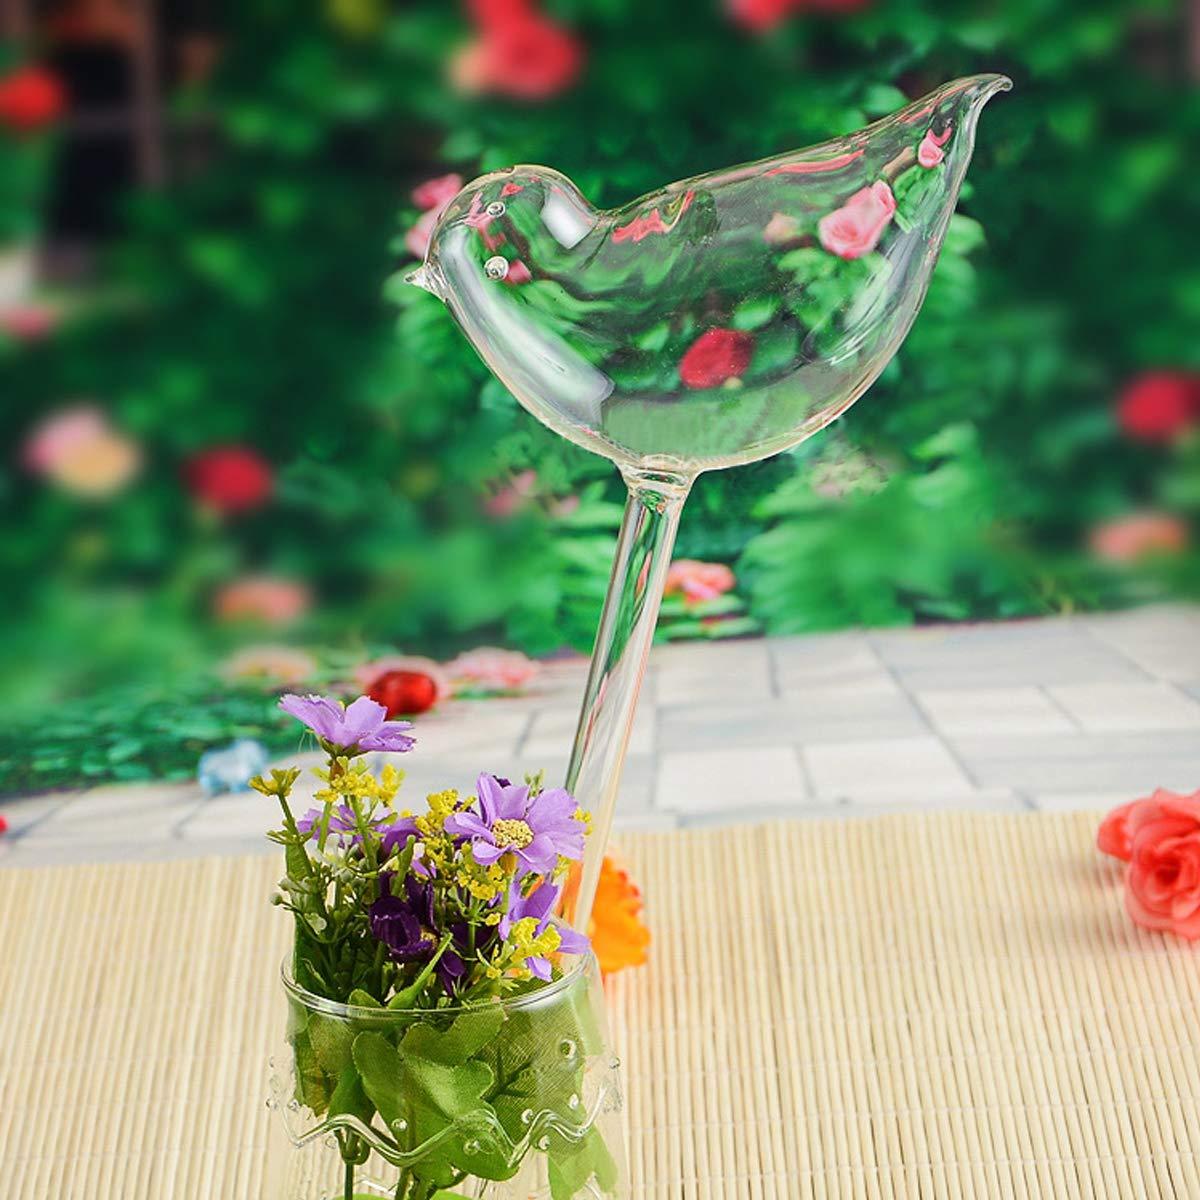 Kitchnexus Poetisch p/ájaro Forma autom/ática de sedal Bola de riego Plantas Sprinkler Wasserspender Glasbl/äserei Transparent 4pcs